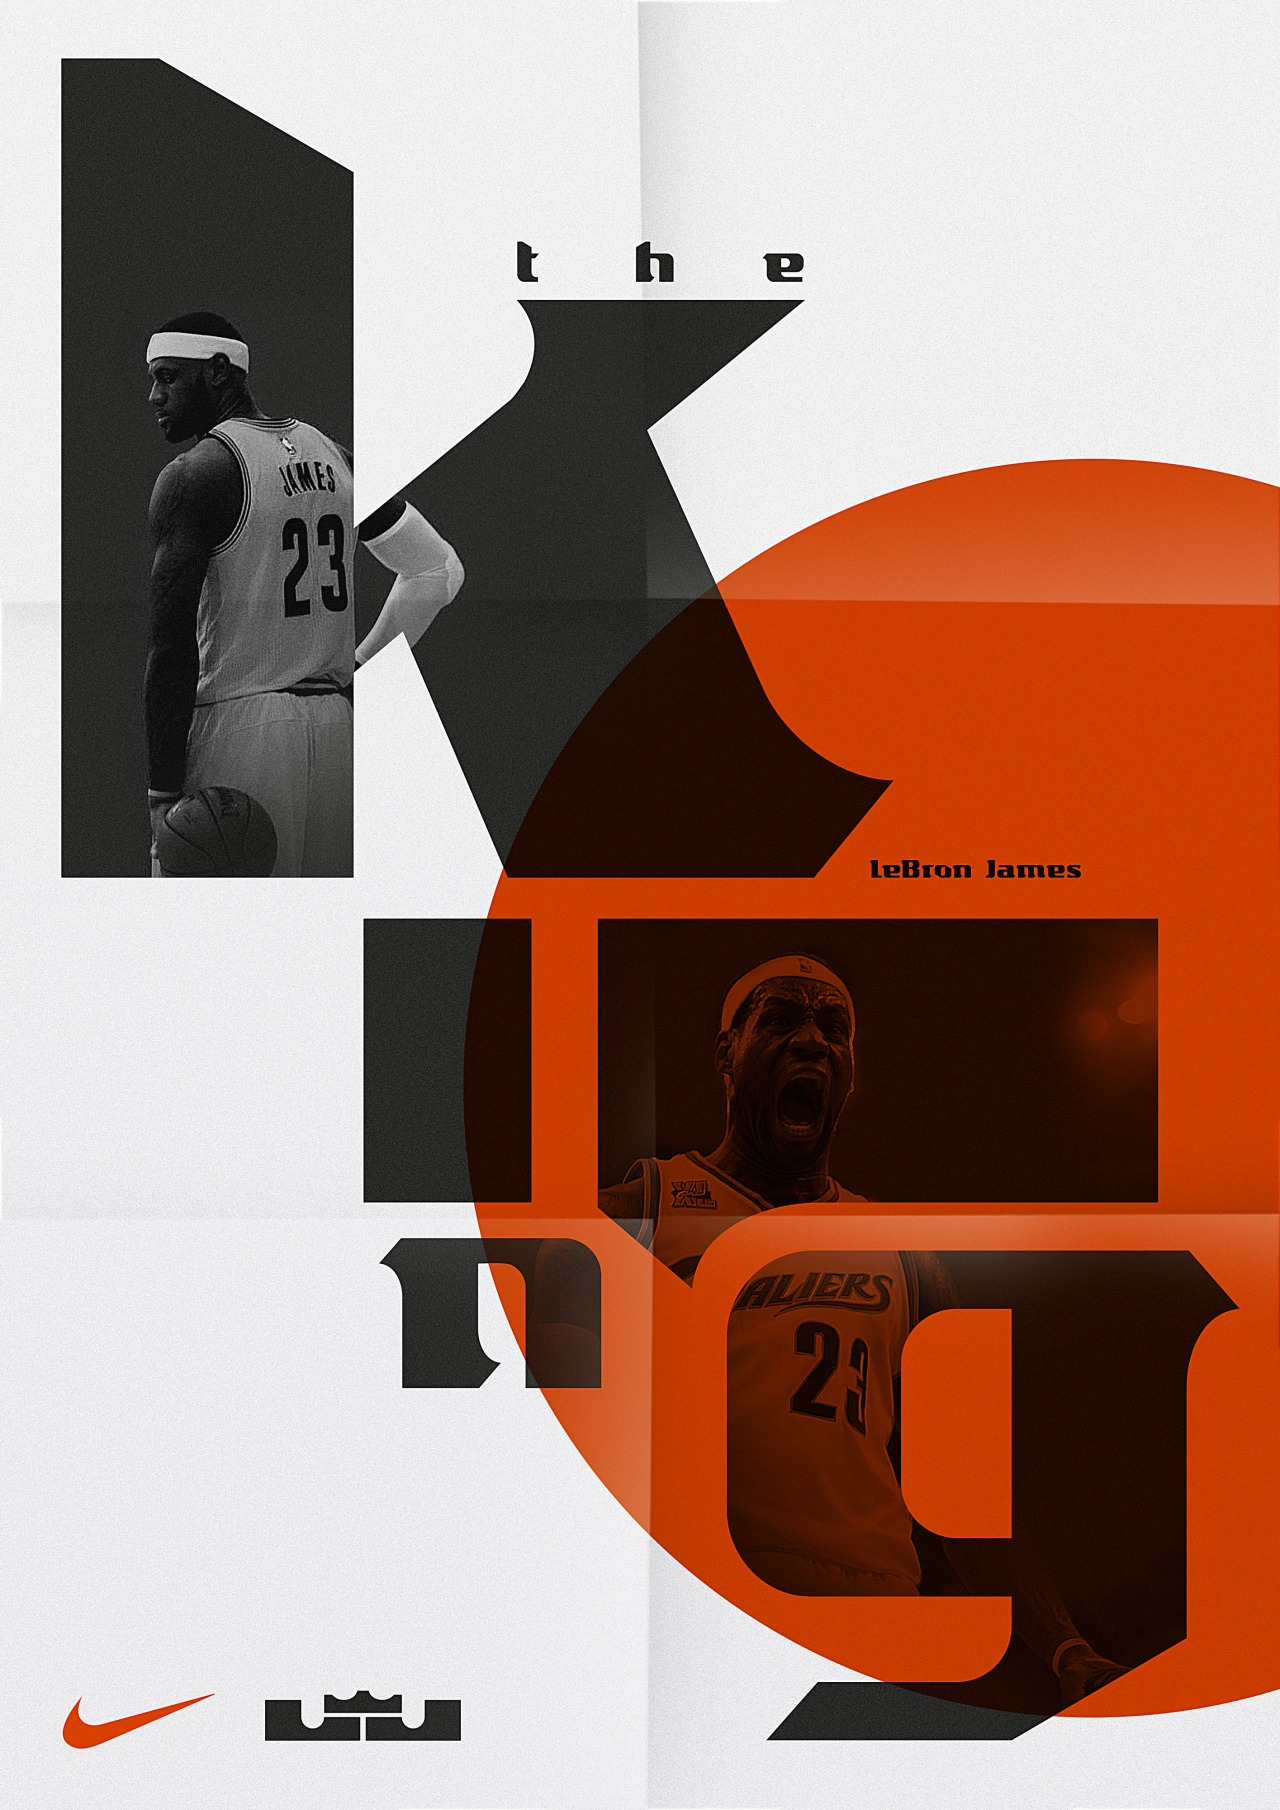 lebron-james-typeface-1-1280x1810.jpg